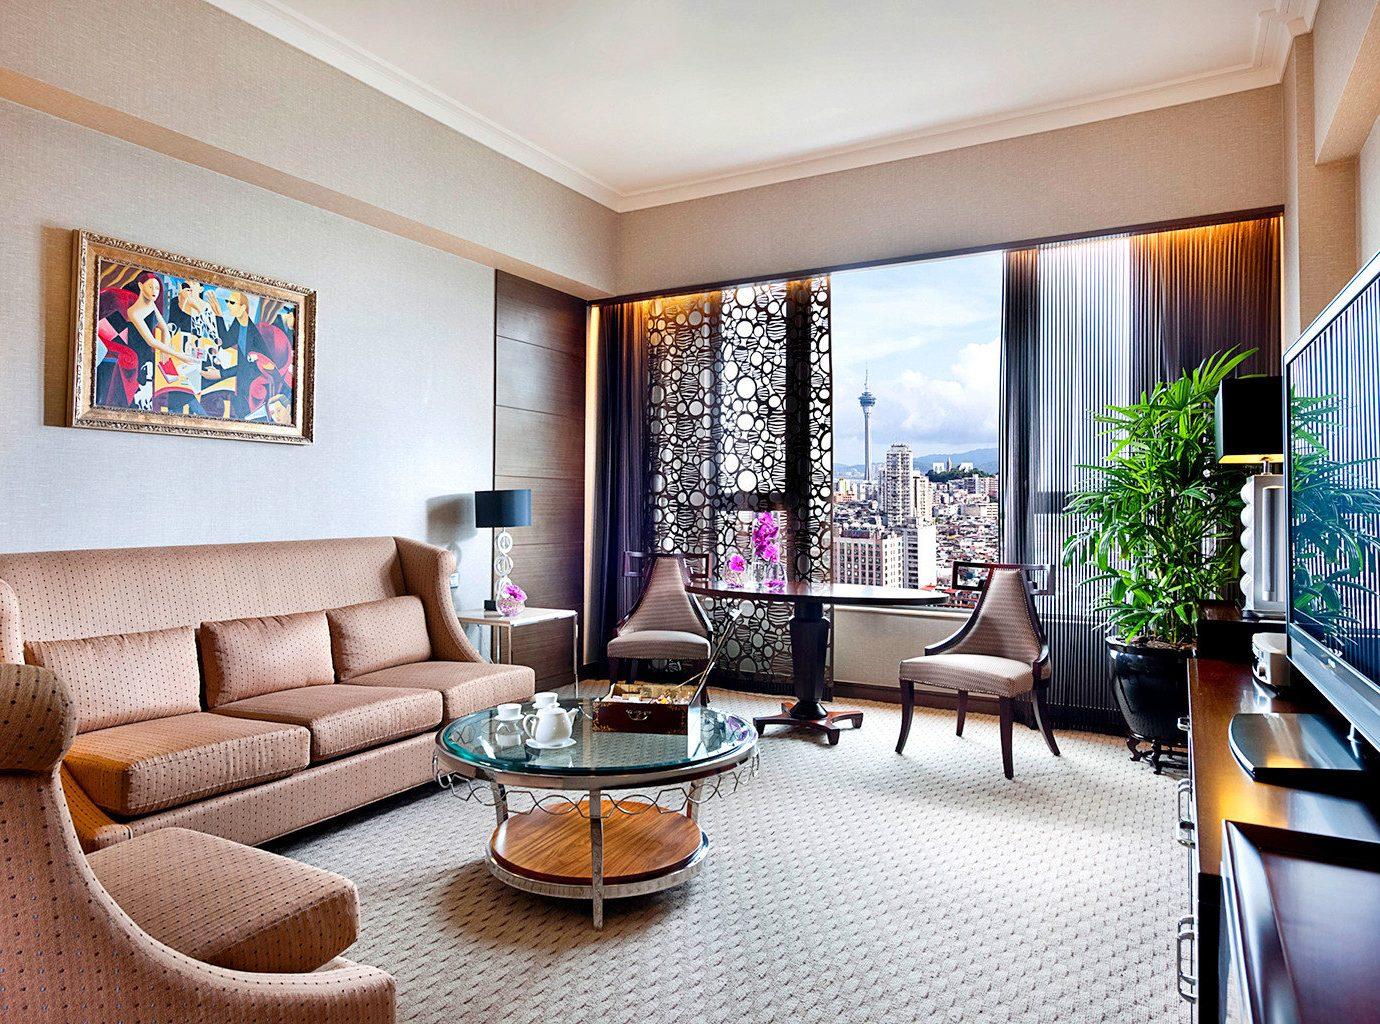 City Resort Scenic views property condominium living room home Suite Villa cottage